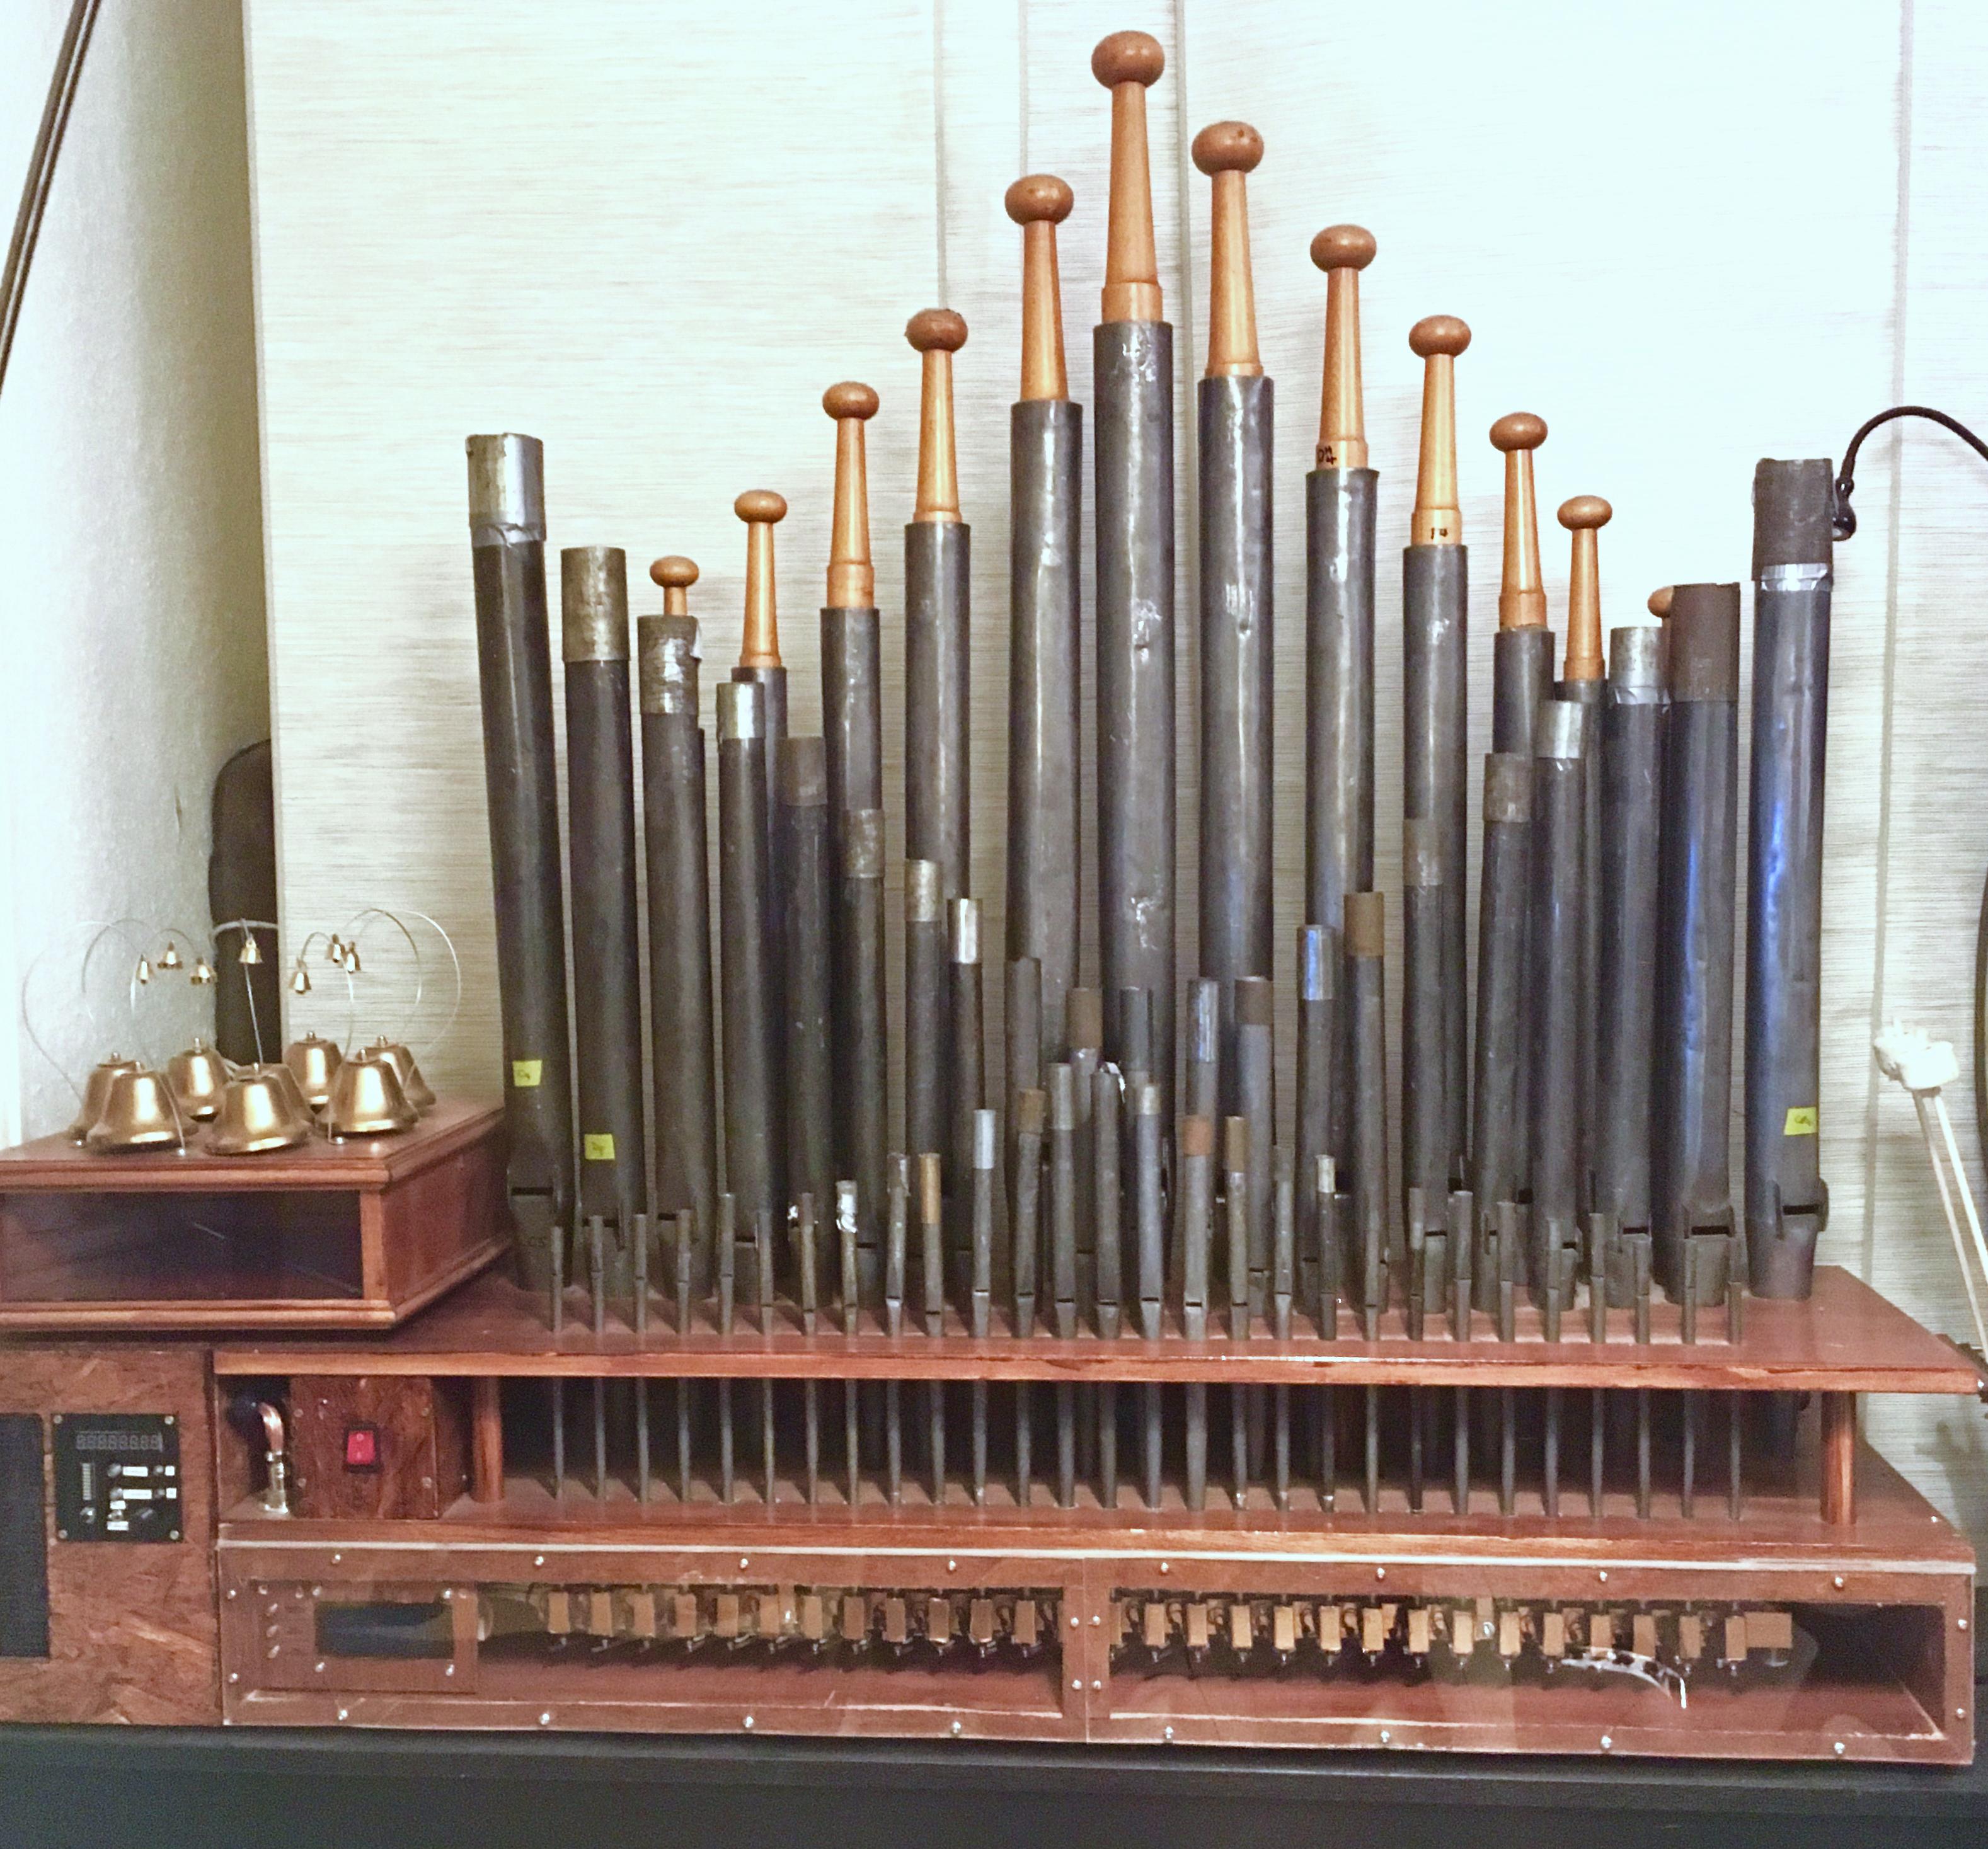 The PipeDream61 single-rank pipe organ